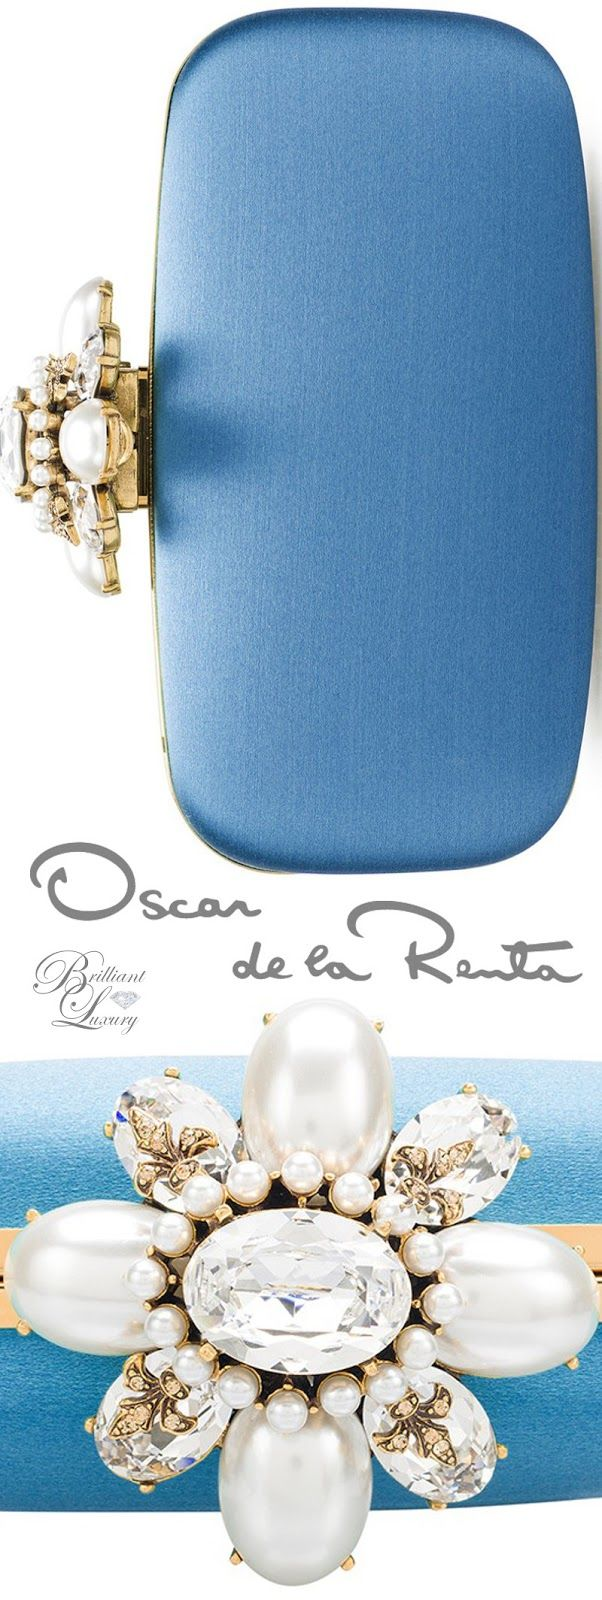 Brilliant Luxury * Oscar de la Renta Tanzanite Satin Cabochon Goa